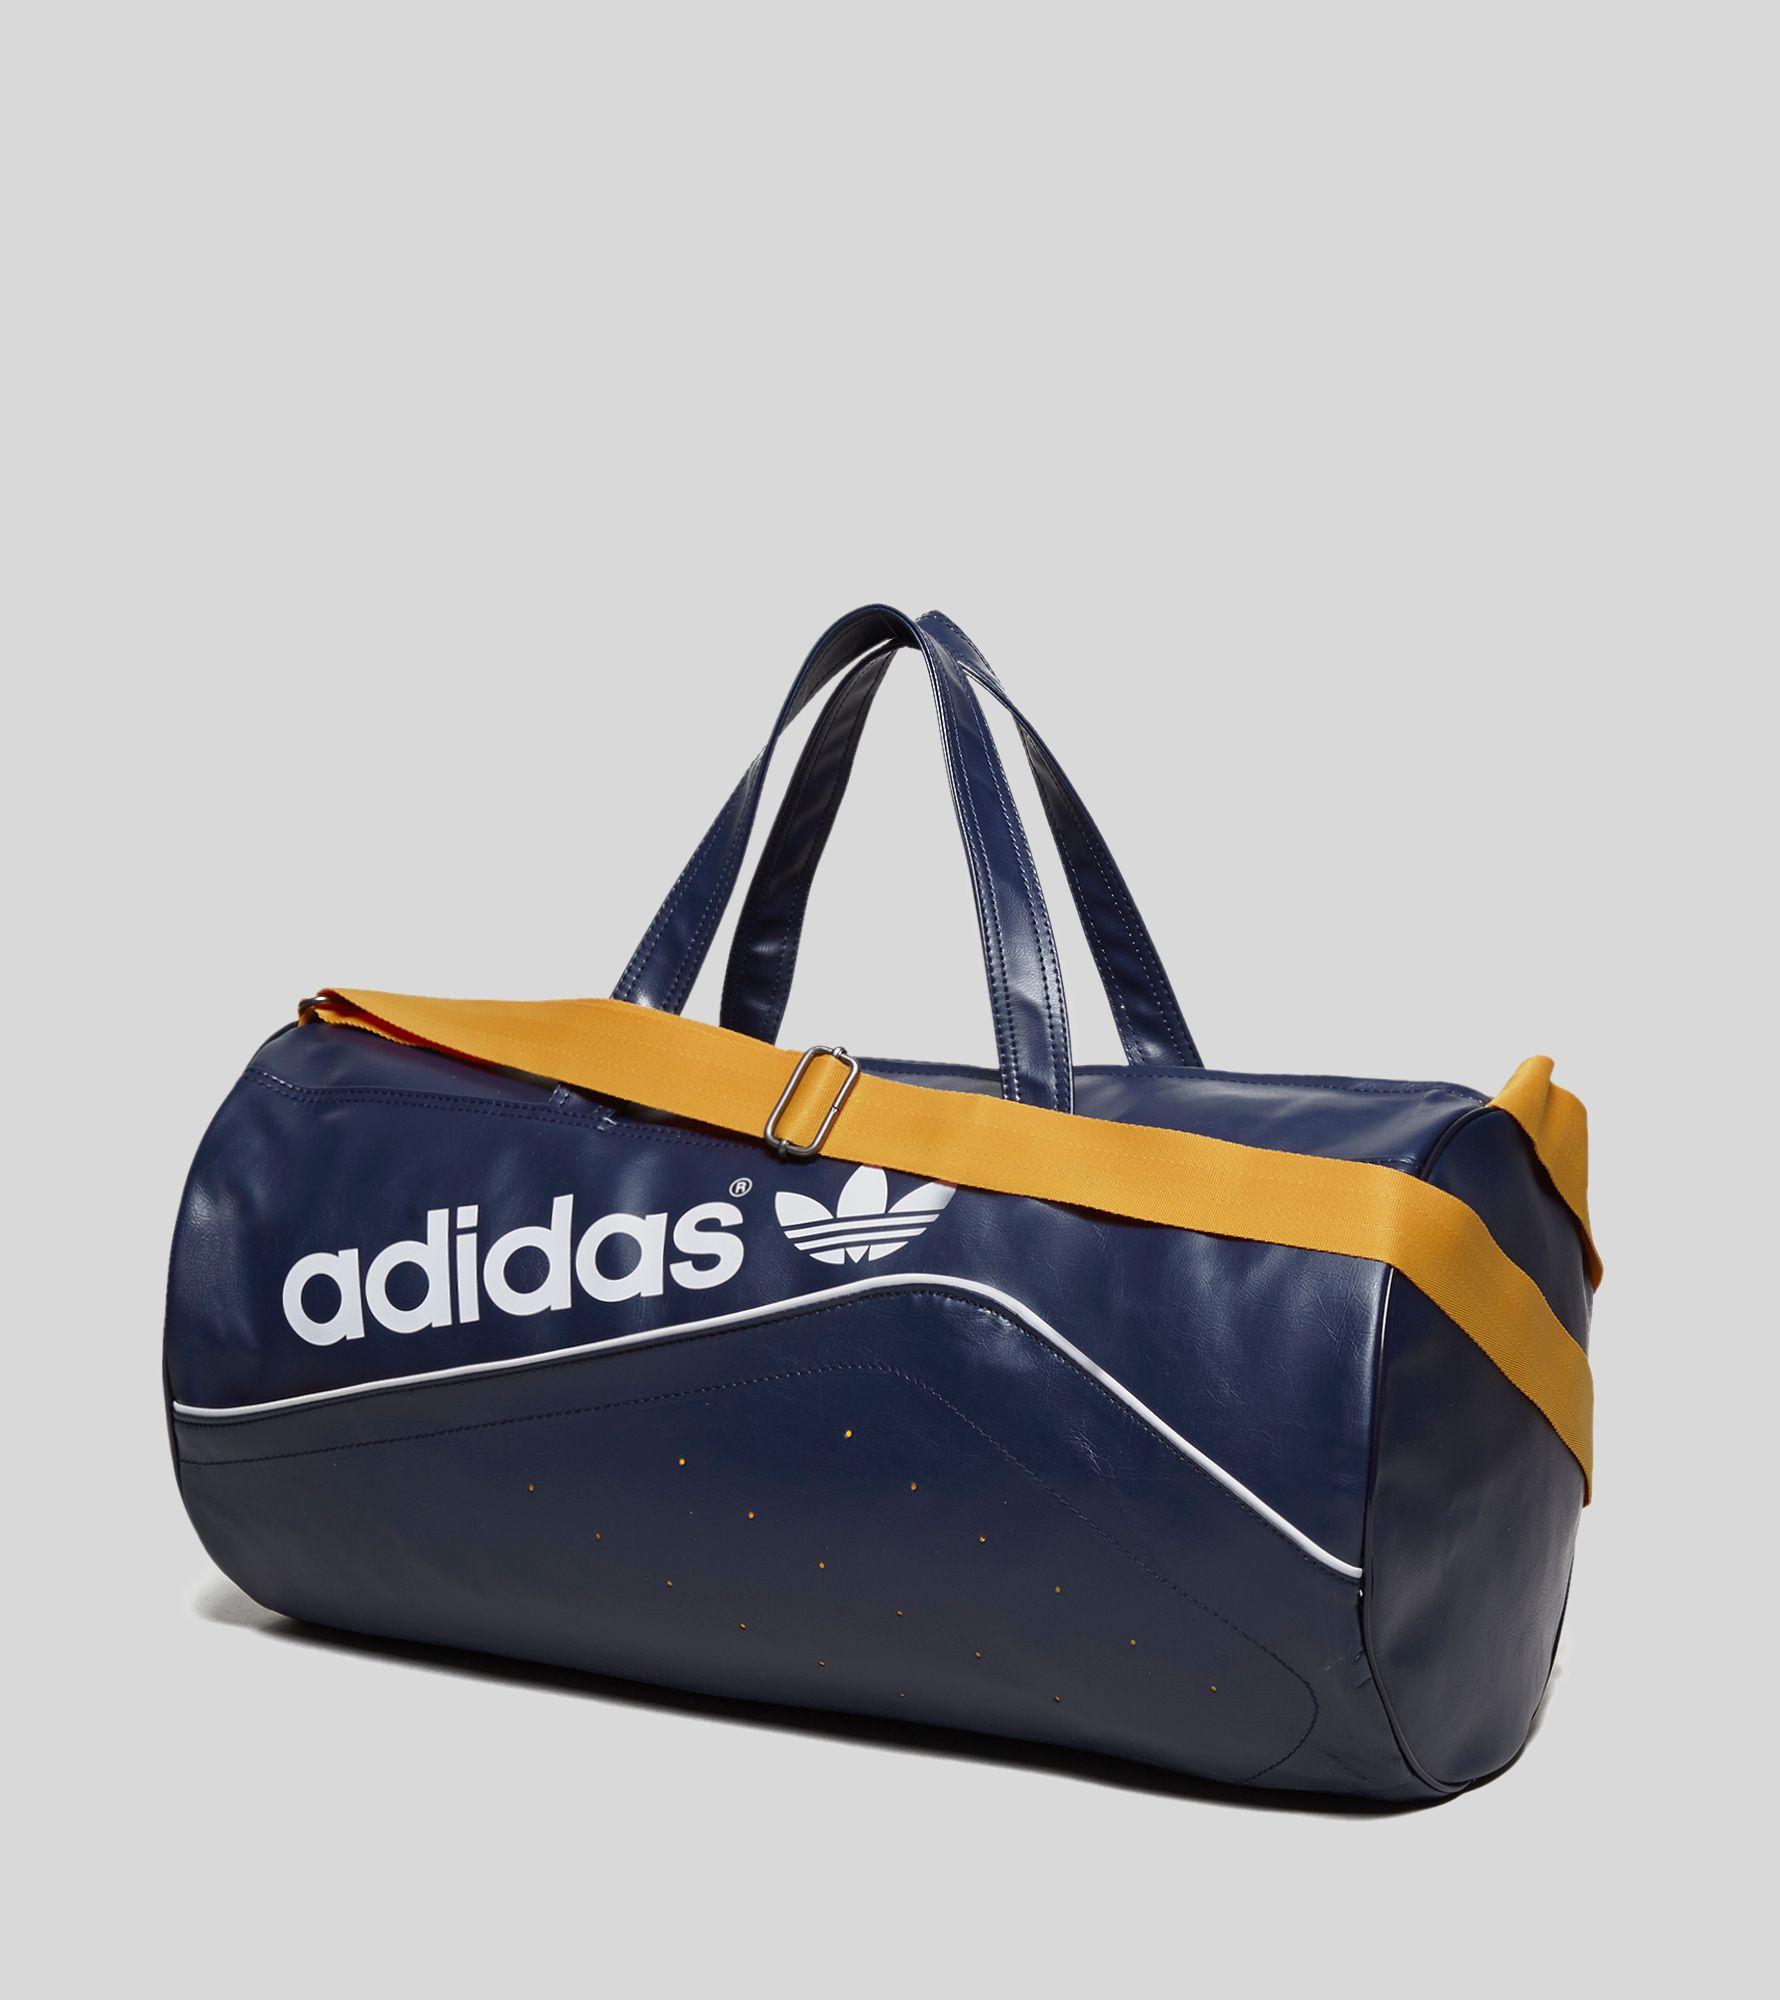 adidas originals perforated duffle bag size